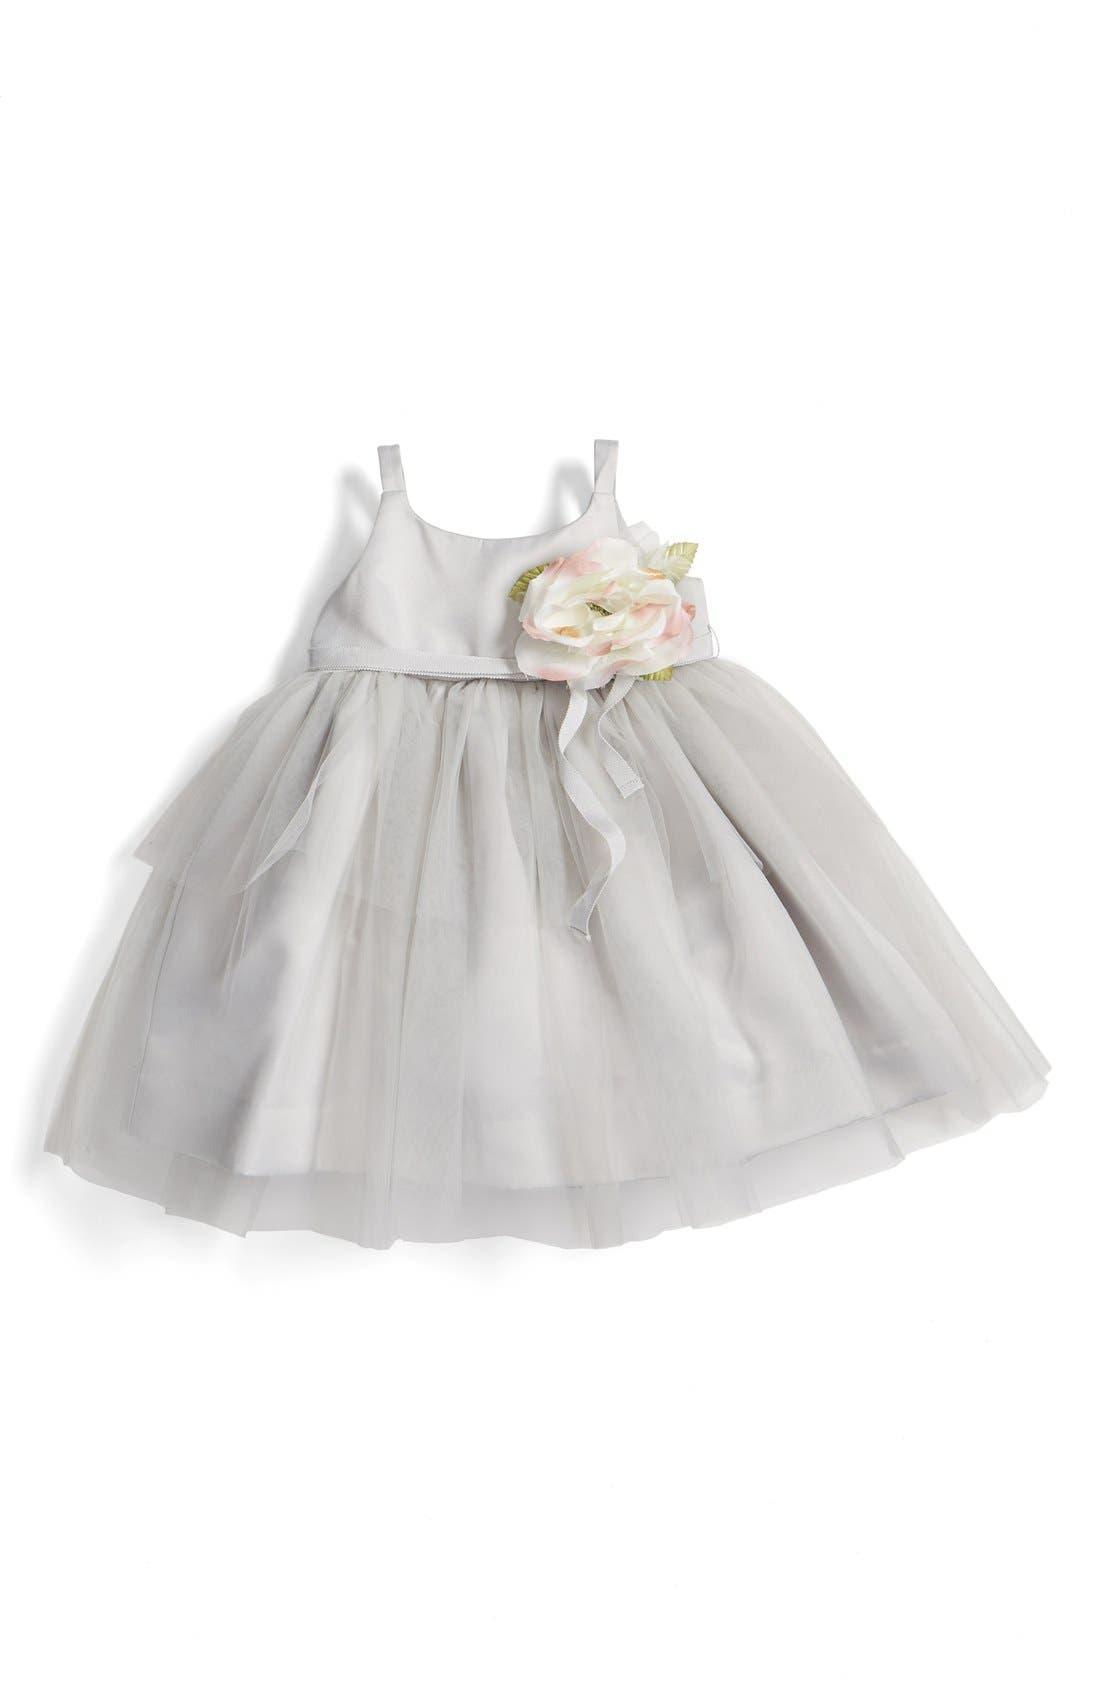 Tulle Ballerina Dress,                             Main thumbnail 1, color,                             Silver